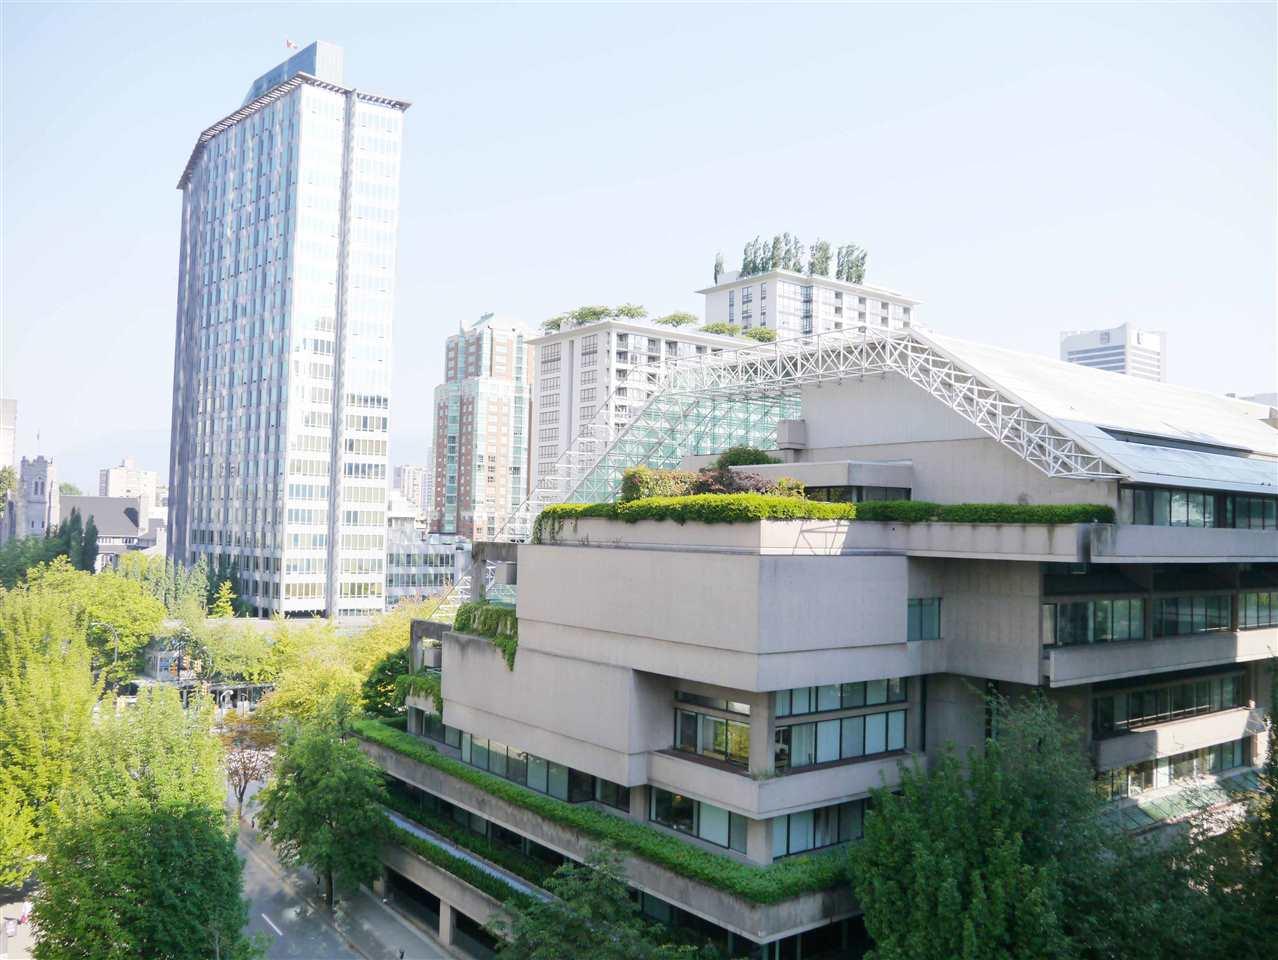 Condo Apartment at 701 1010 HOWE STREET, Unit 701, Vancouver West, British Columbia. Image 1